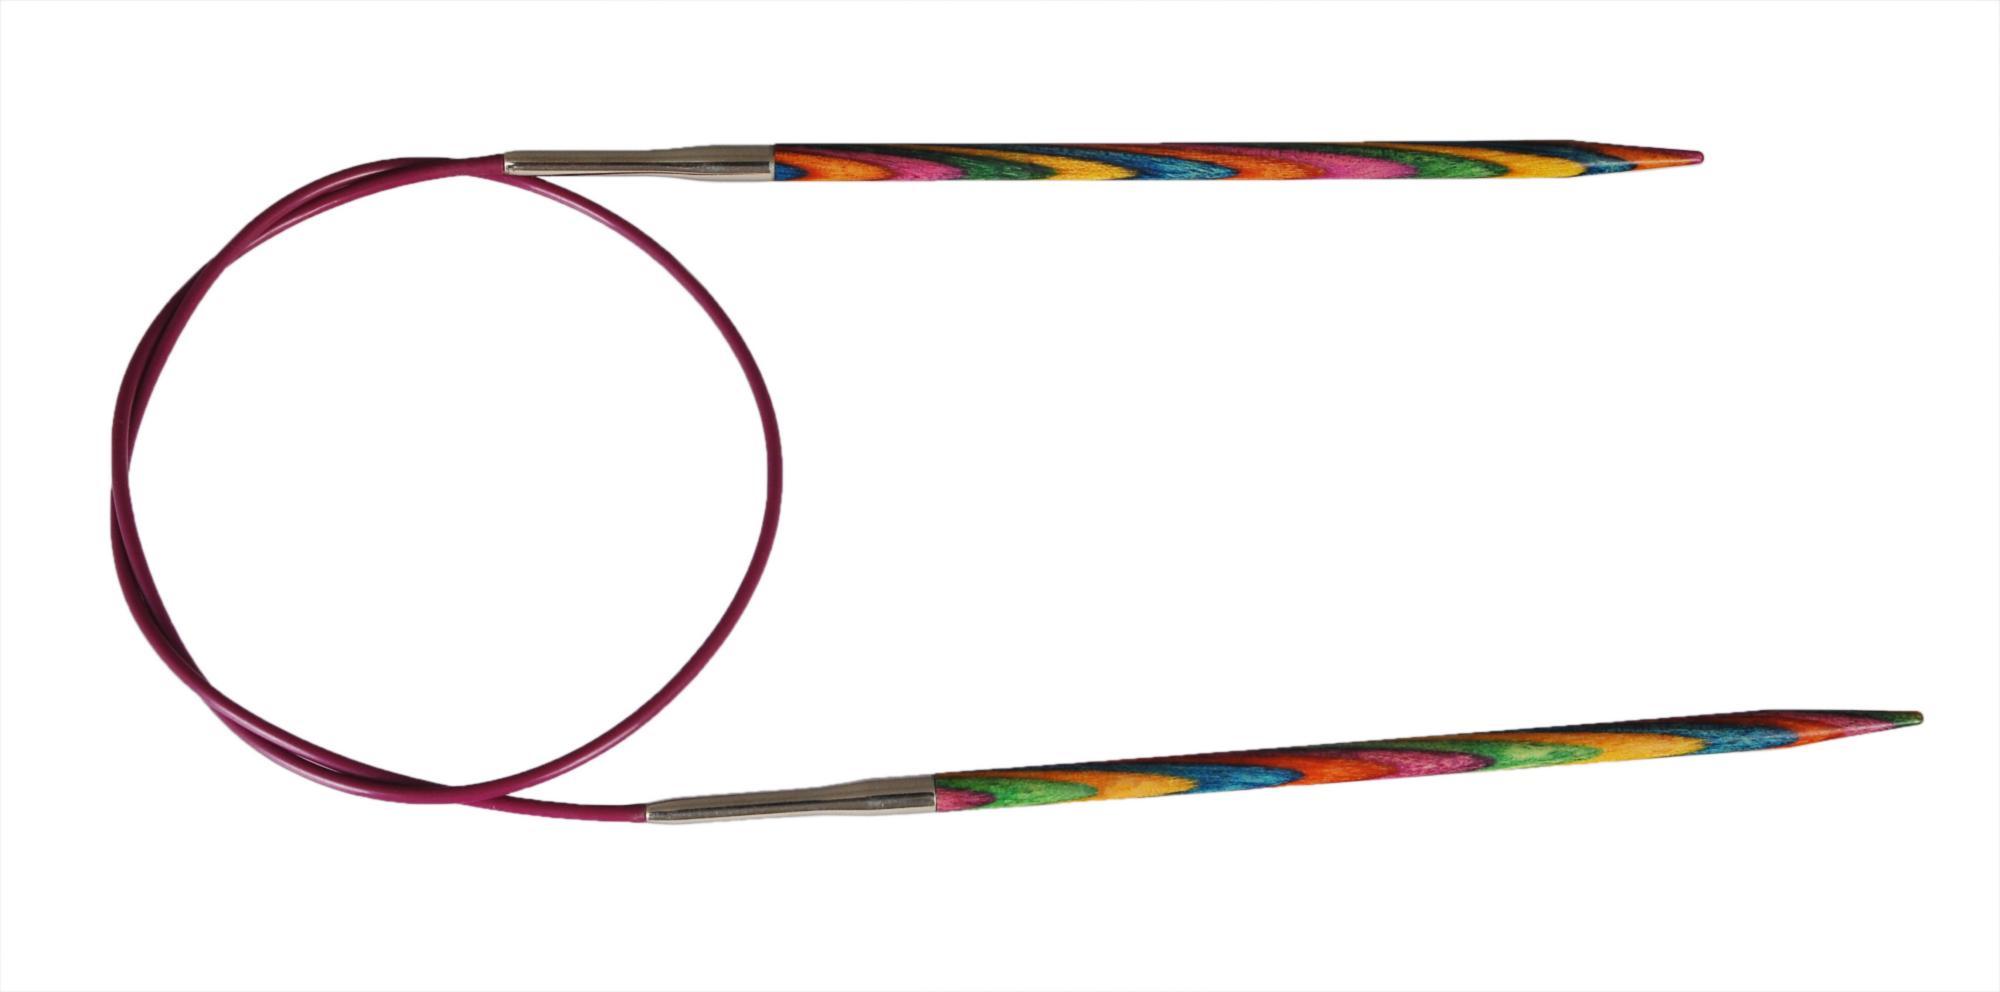 Спицы круговые 120 см Symfonie Wood KnitPro, 20367, 2.00 мм